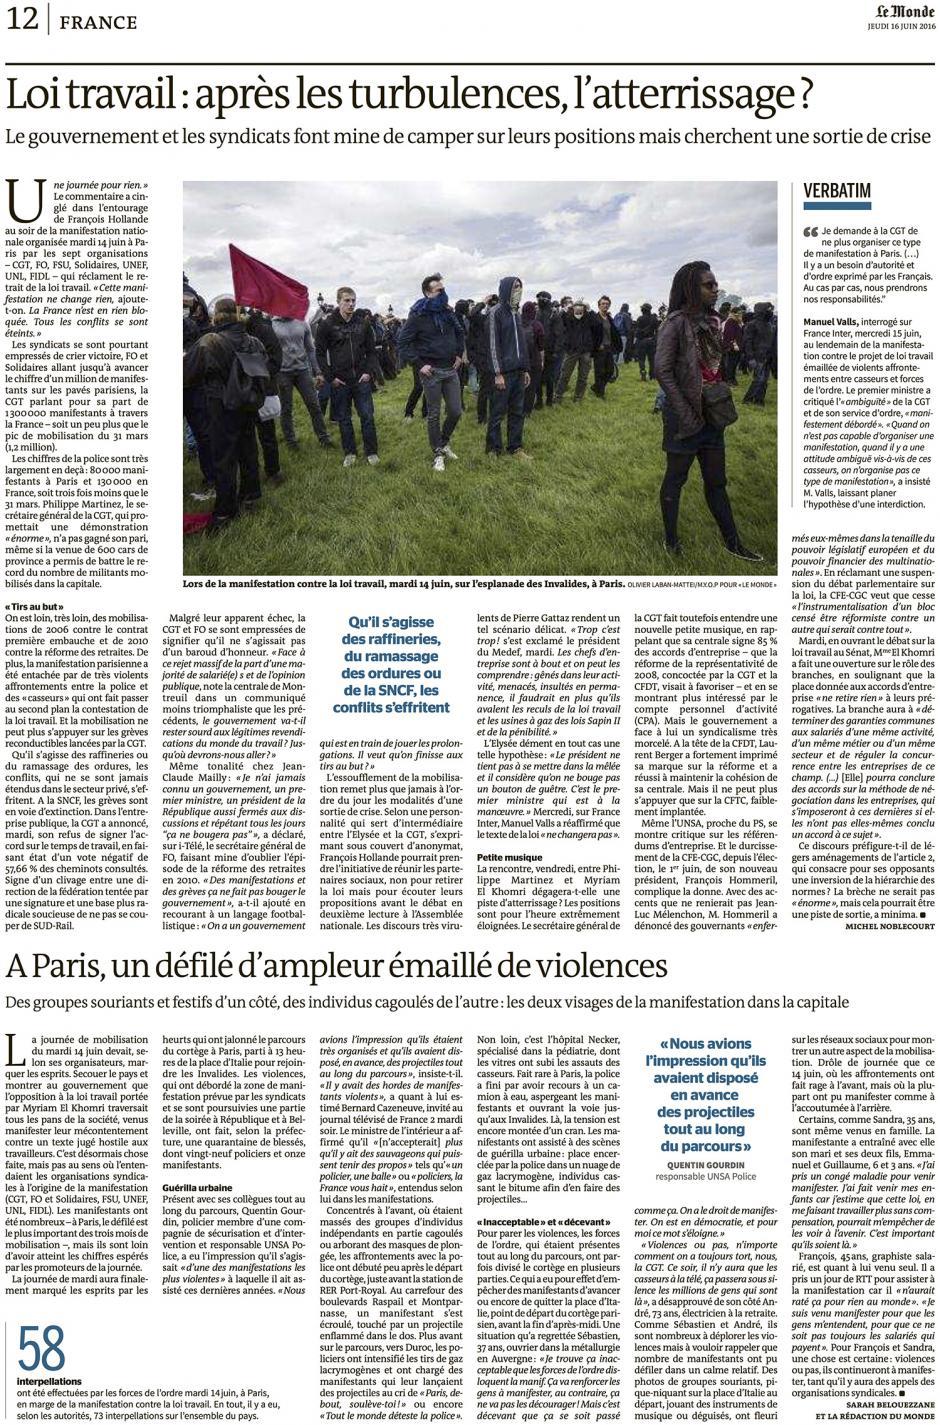 20160616-LeM-France-Loi Travail : après les turbulences, l'atterrissage ?